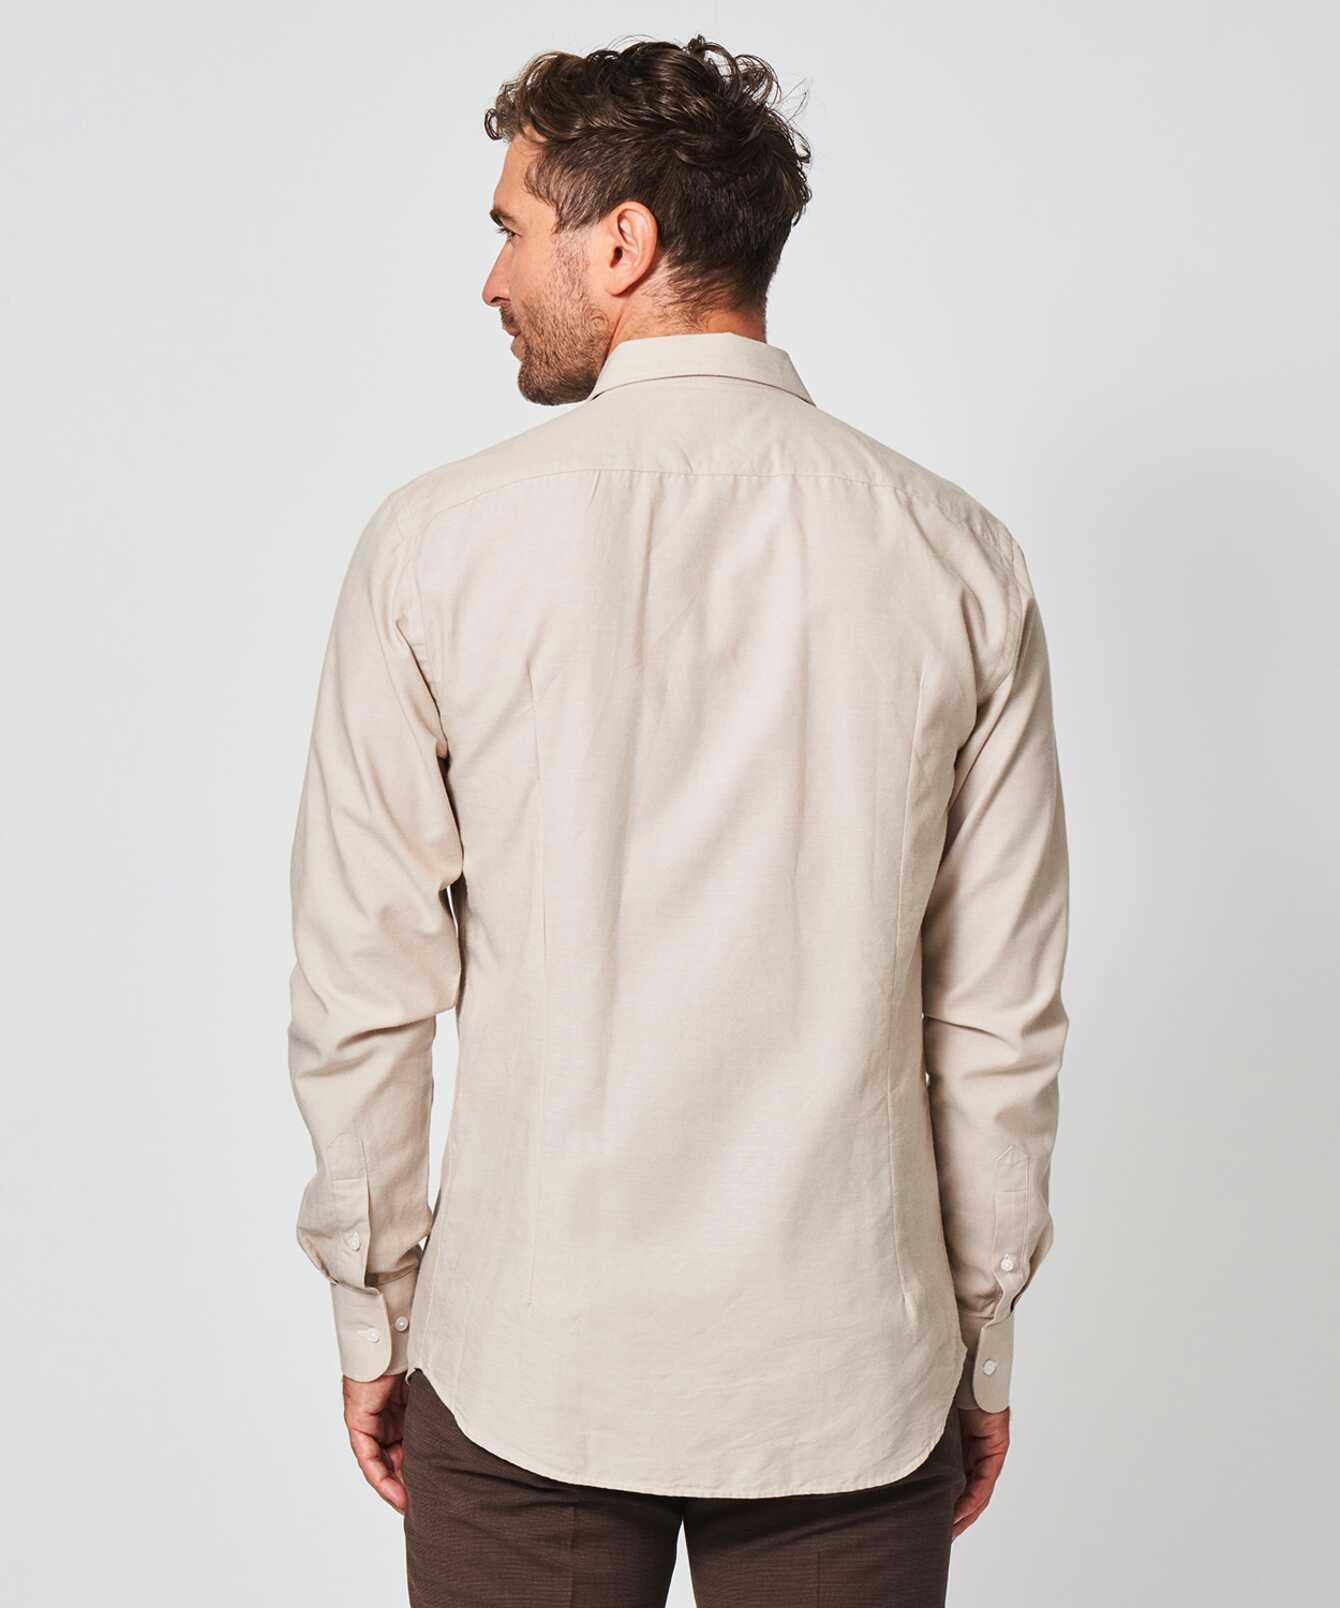 Shirt Olympus The Shirt Factory